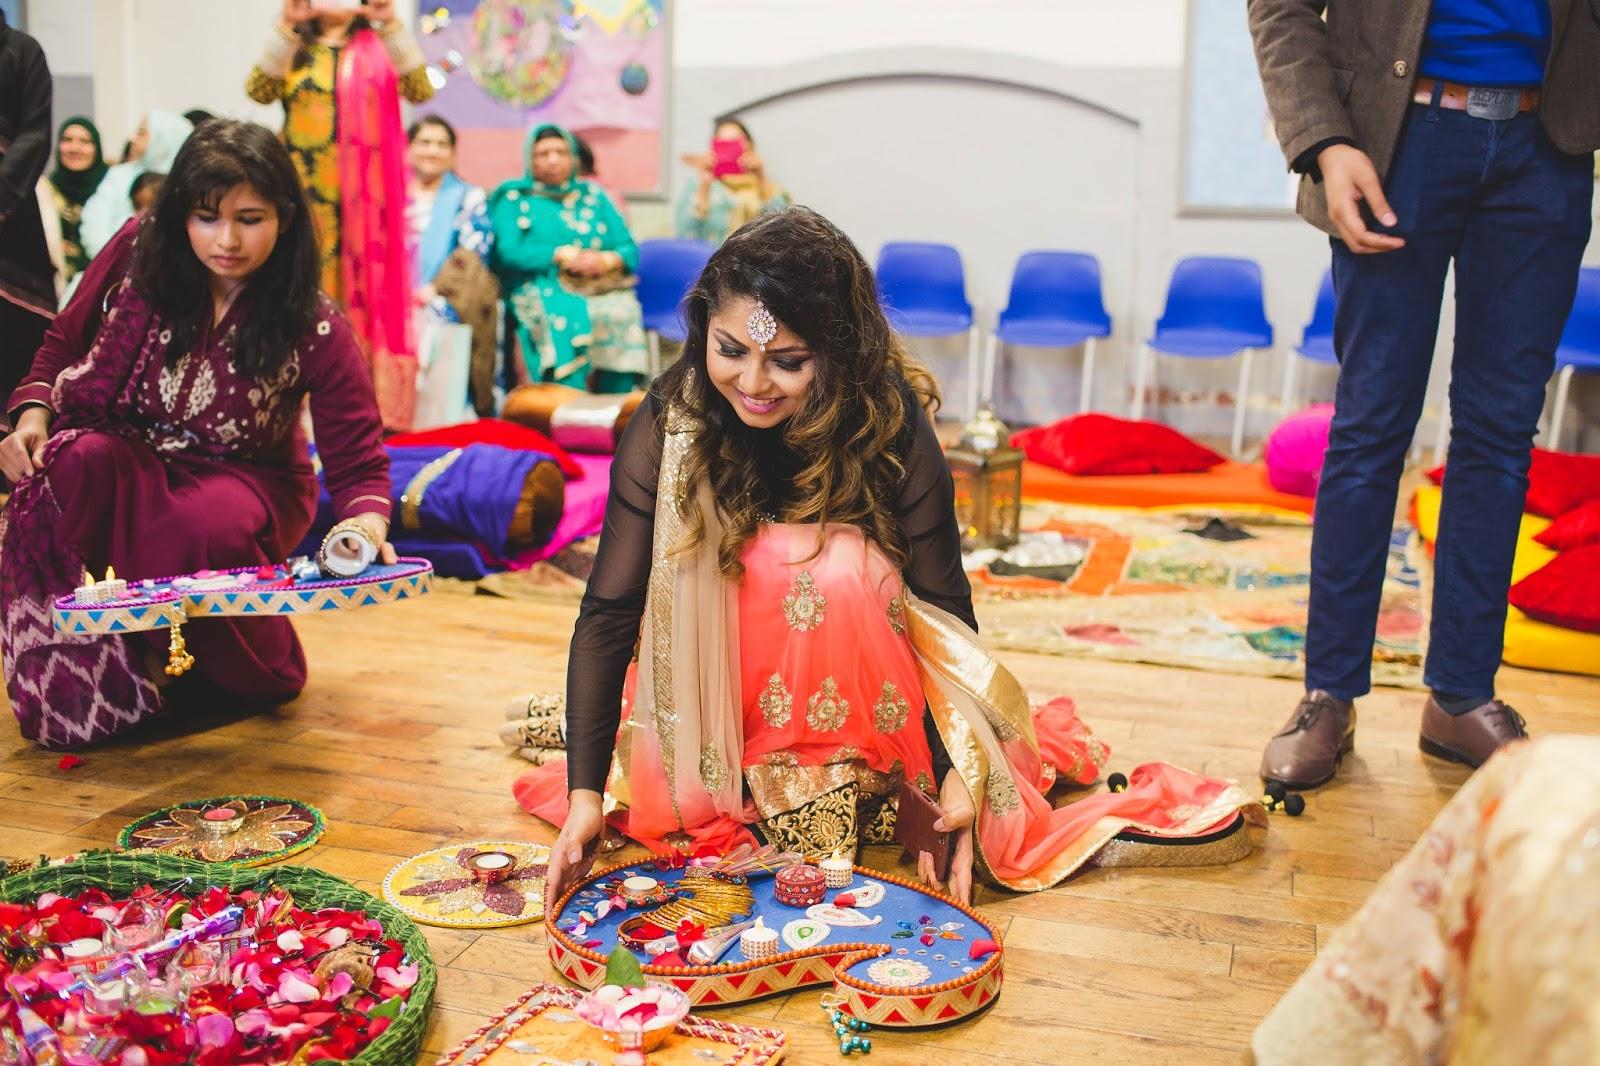 Mehendi Ceremony Look : Get gawjus henna mehndi ceremony outfits makeup